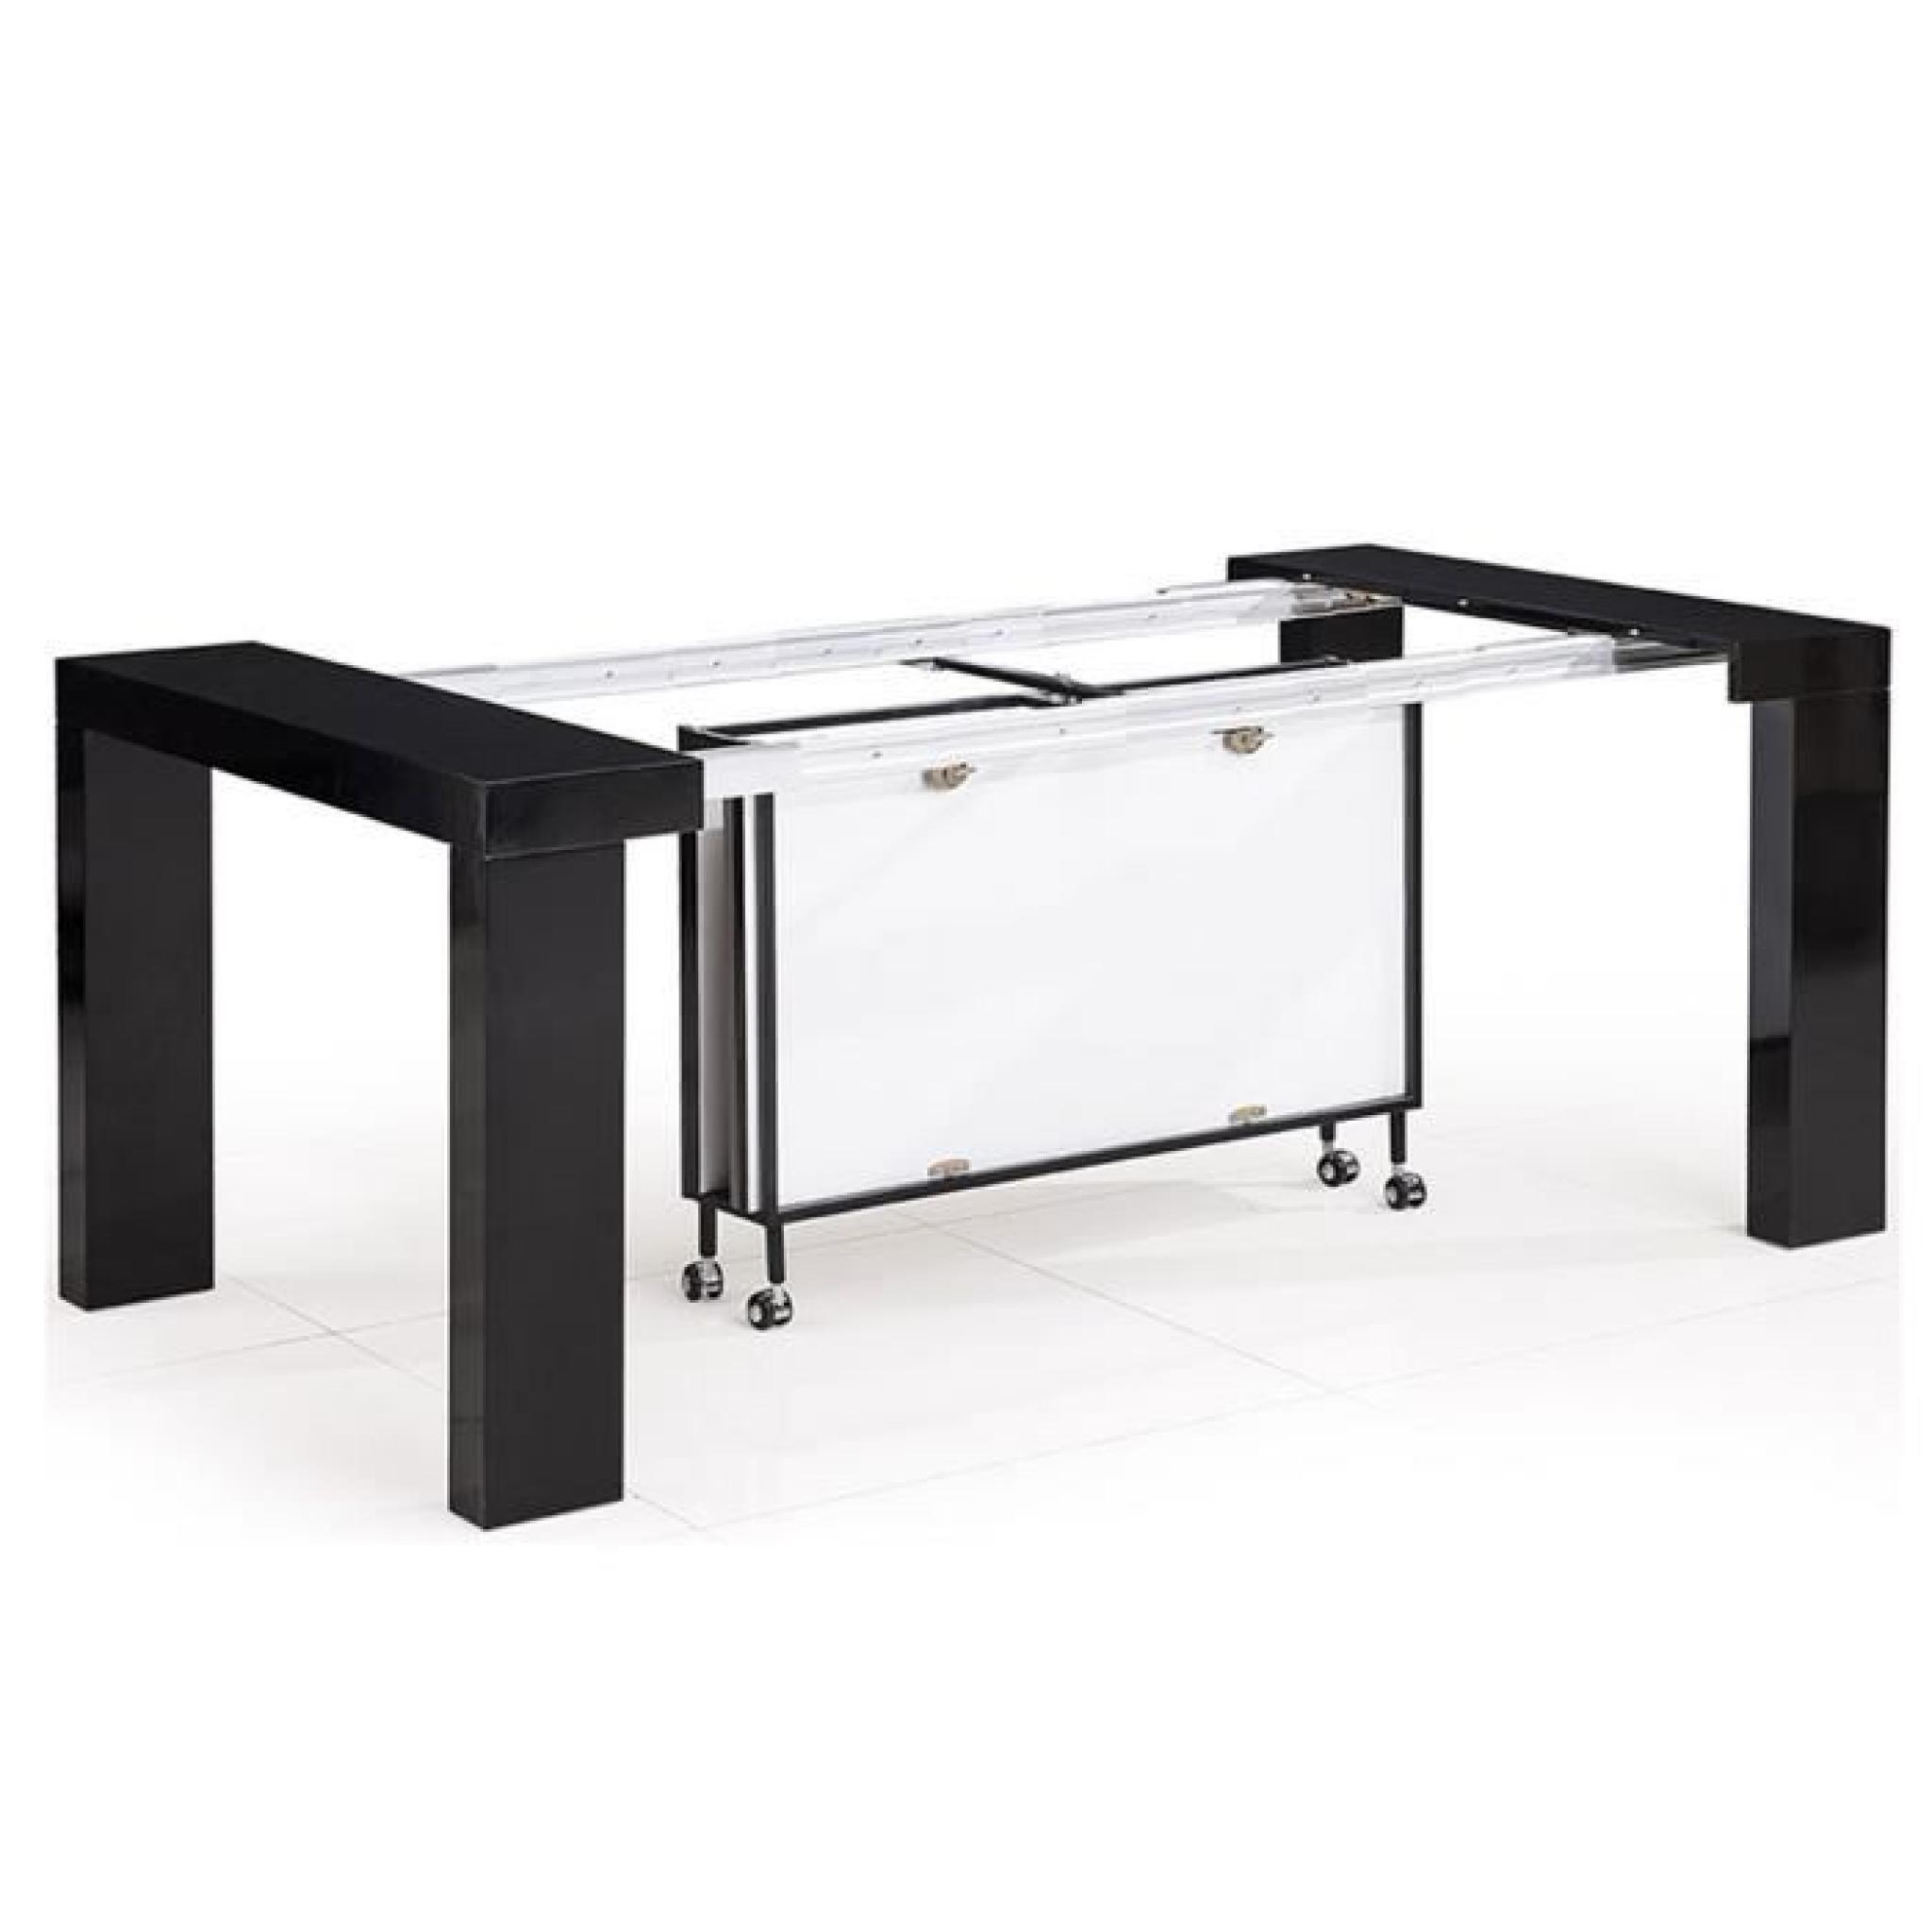 table console noir grande taille bois mdf laqu lamancha. Black Bedroom Furniture Sets. Home Design Ideas